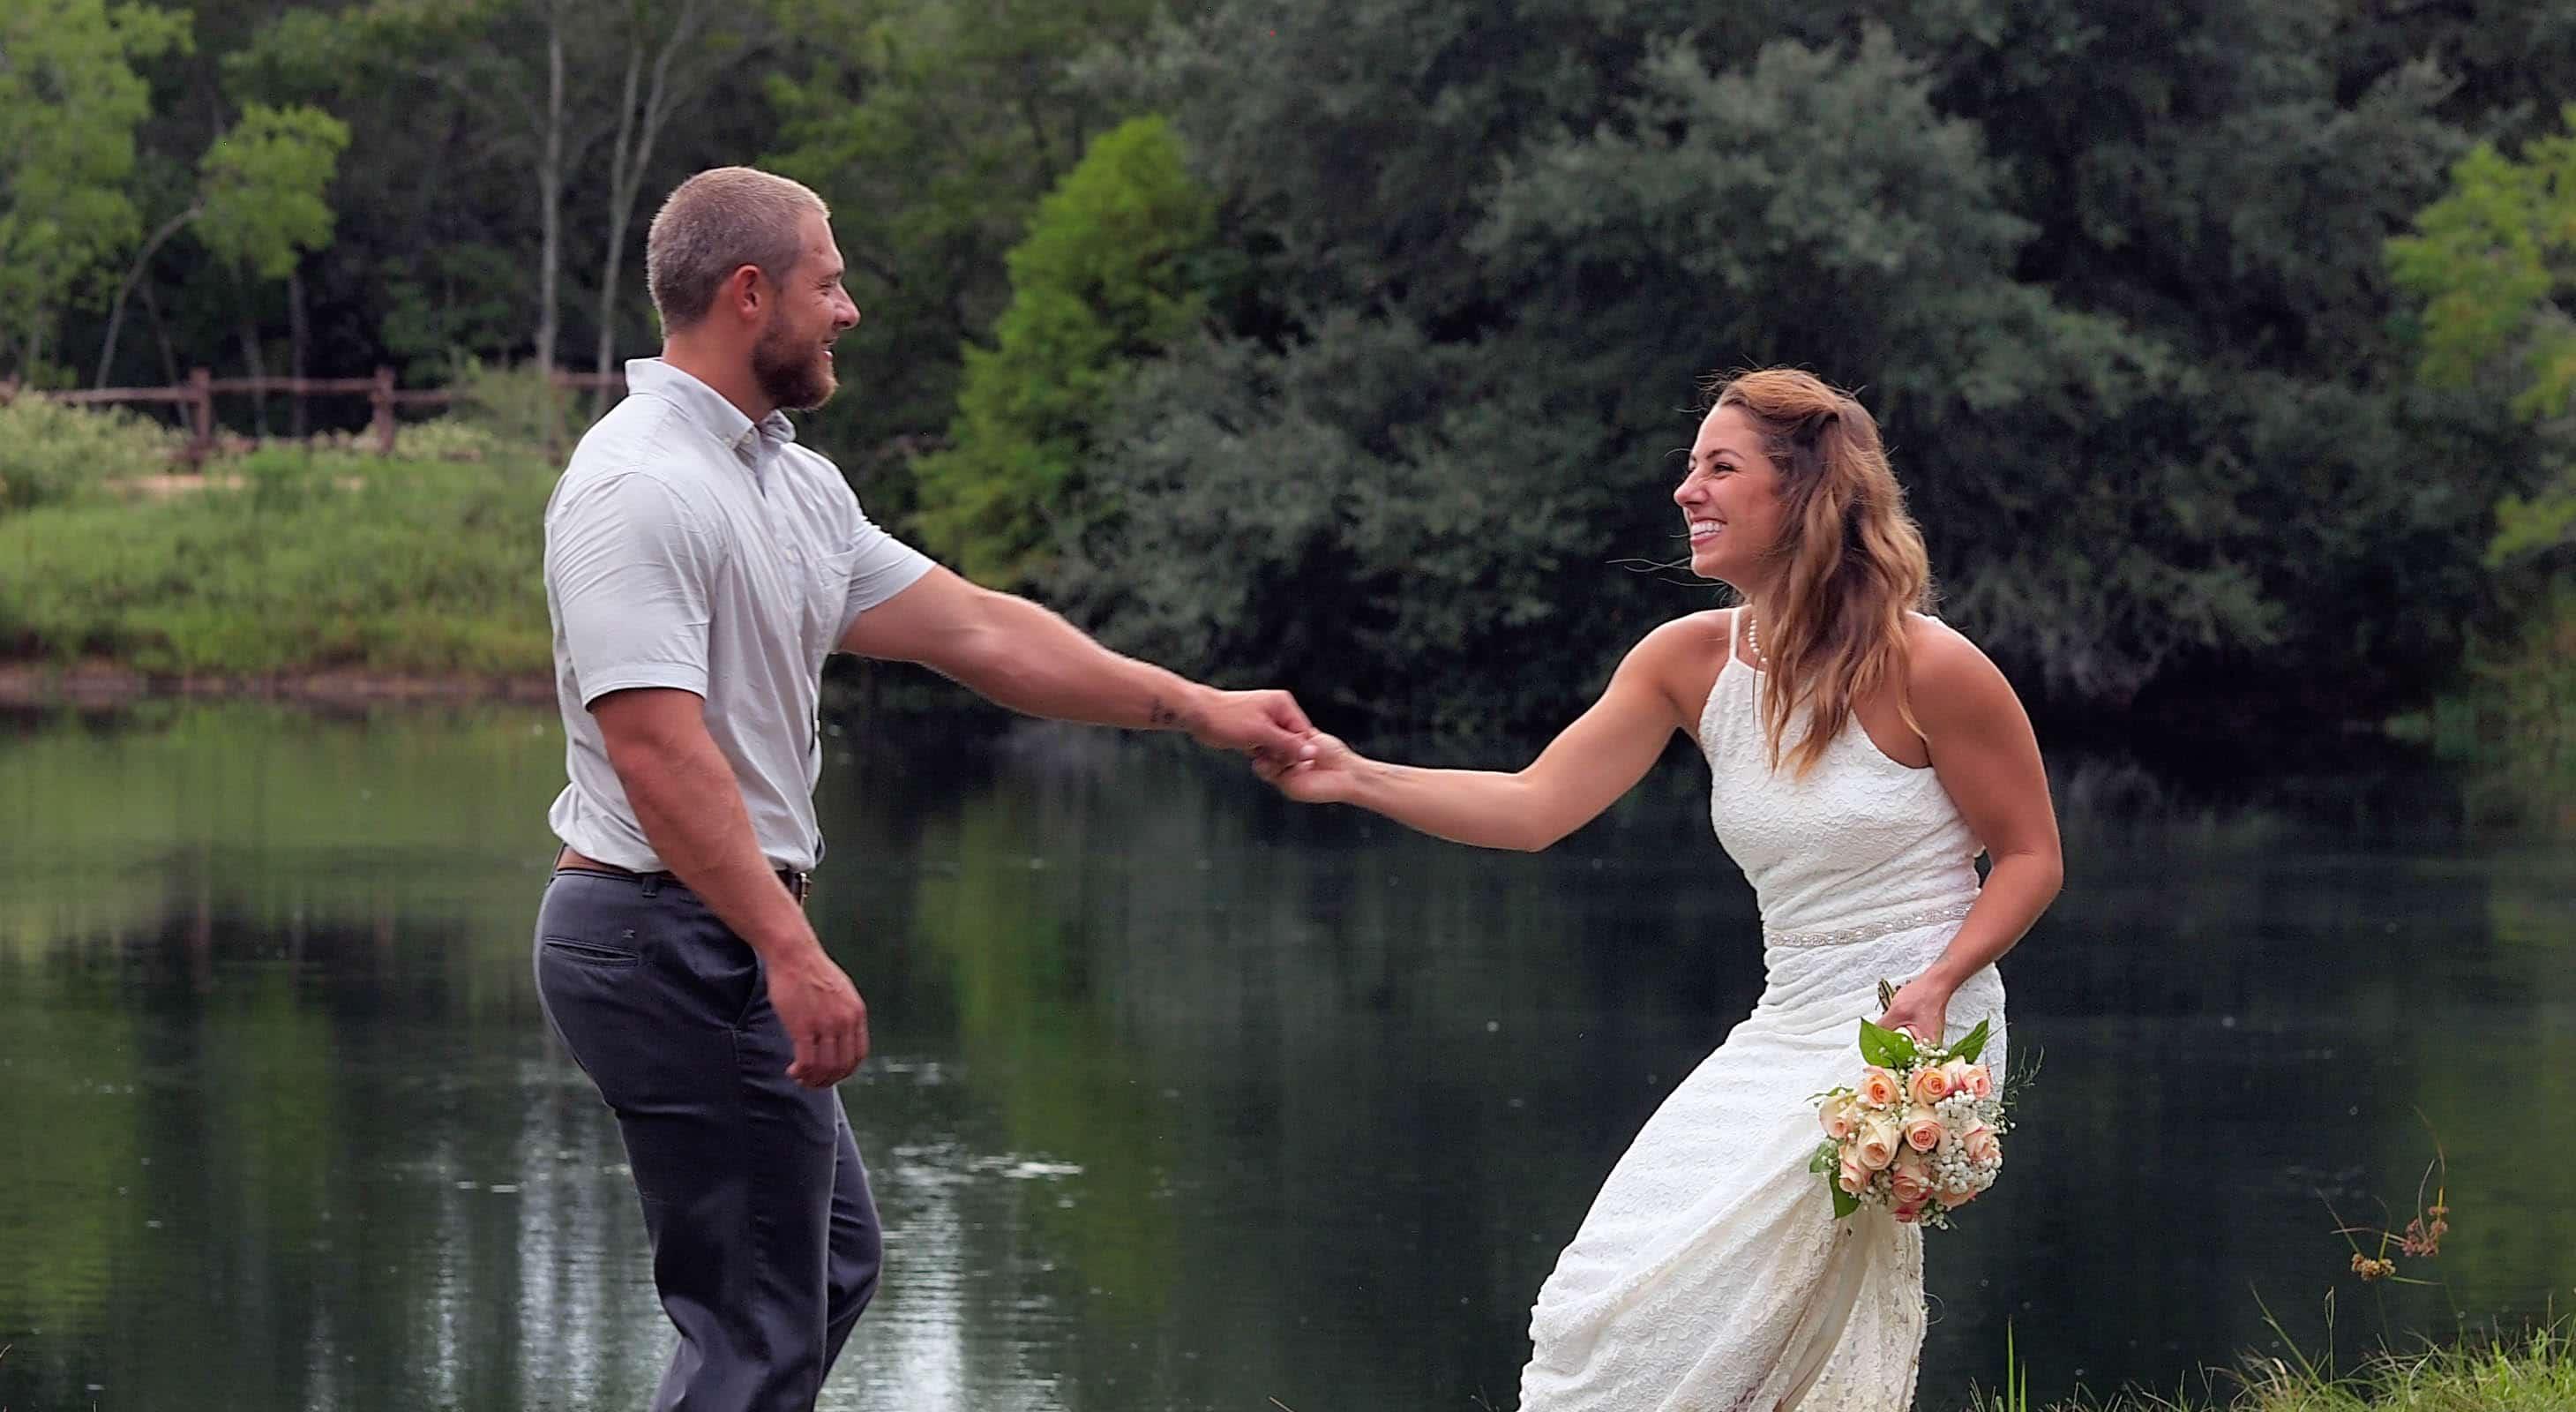 A couple joyfully holding hands